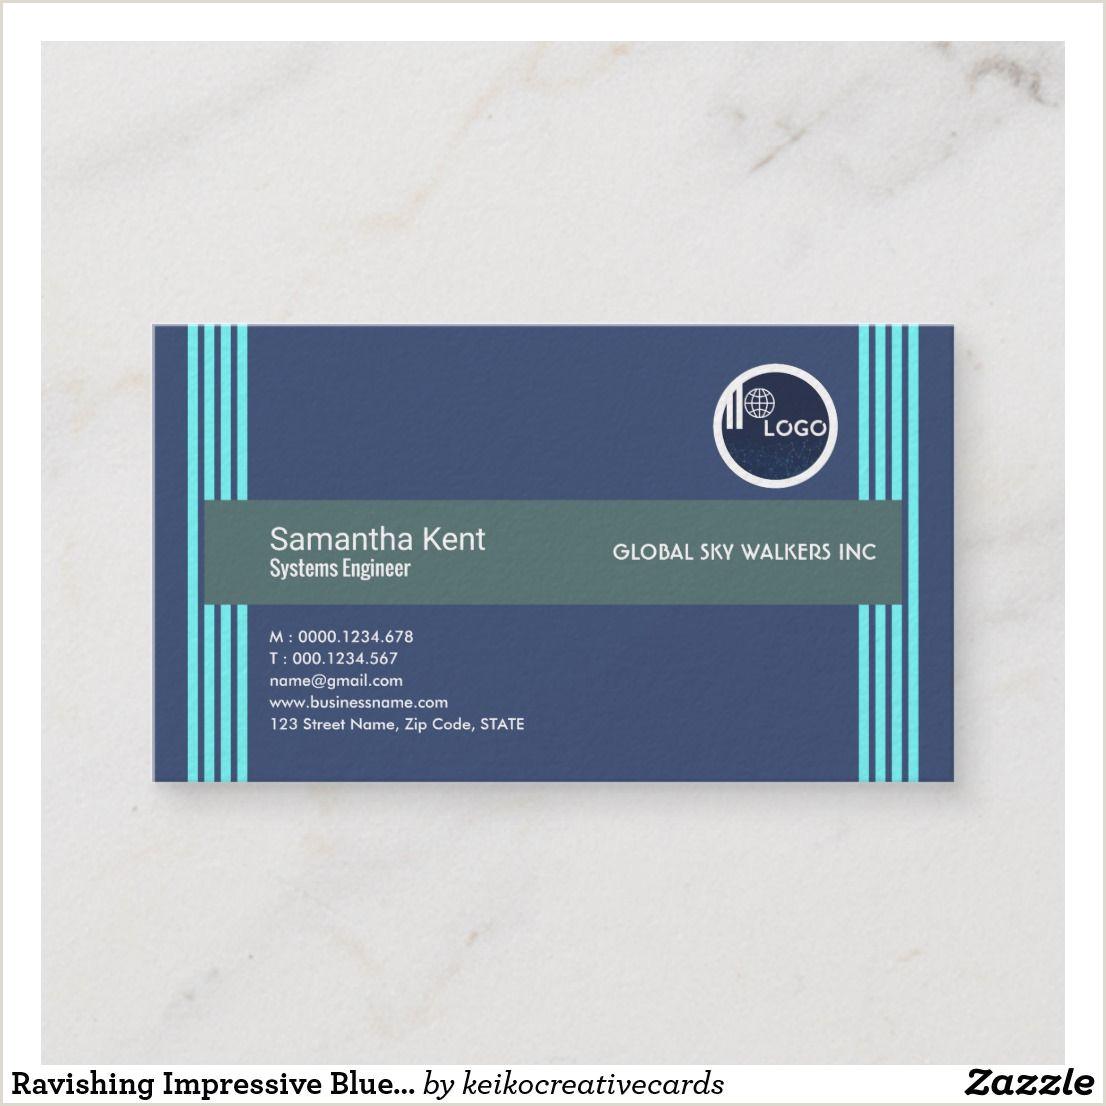 Unique Business Cards Engineering Ravishing Tantalizing Blue Engineer Business Card